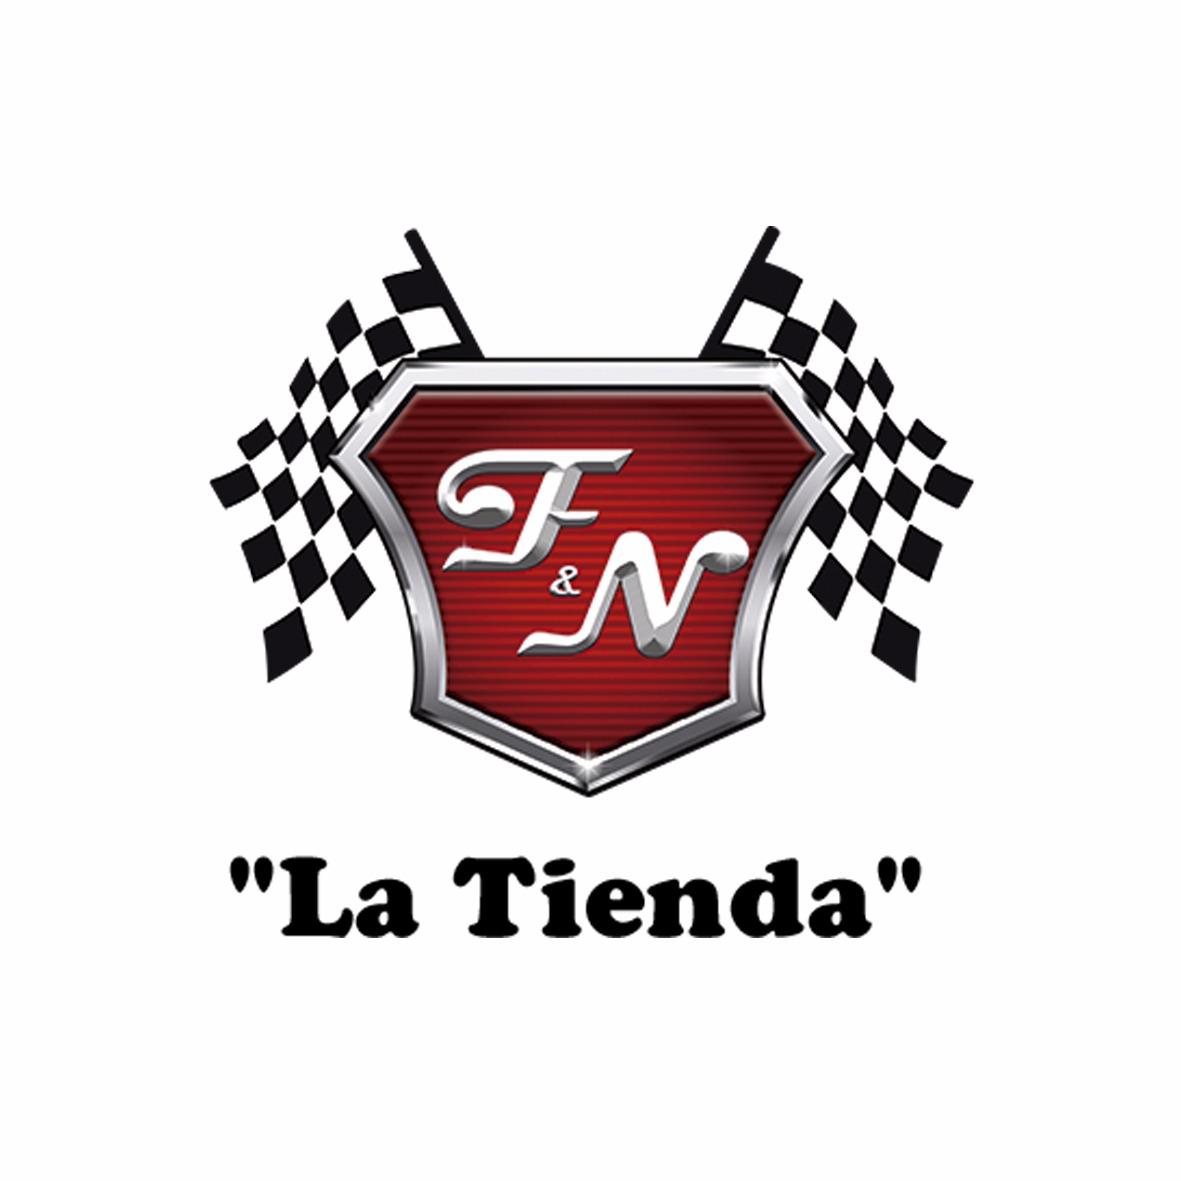 Logo FyN La Tienda,Ago18.jpg